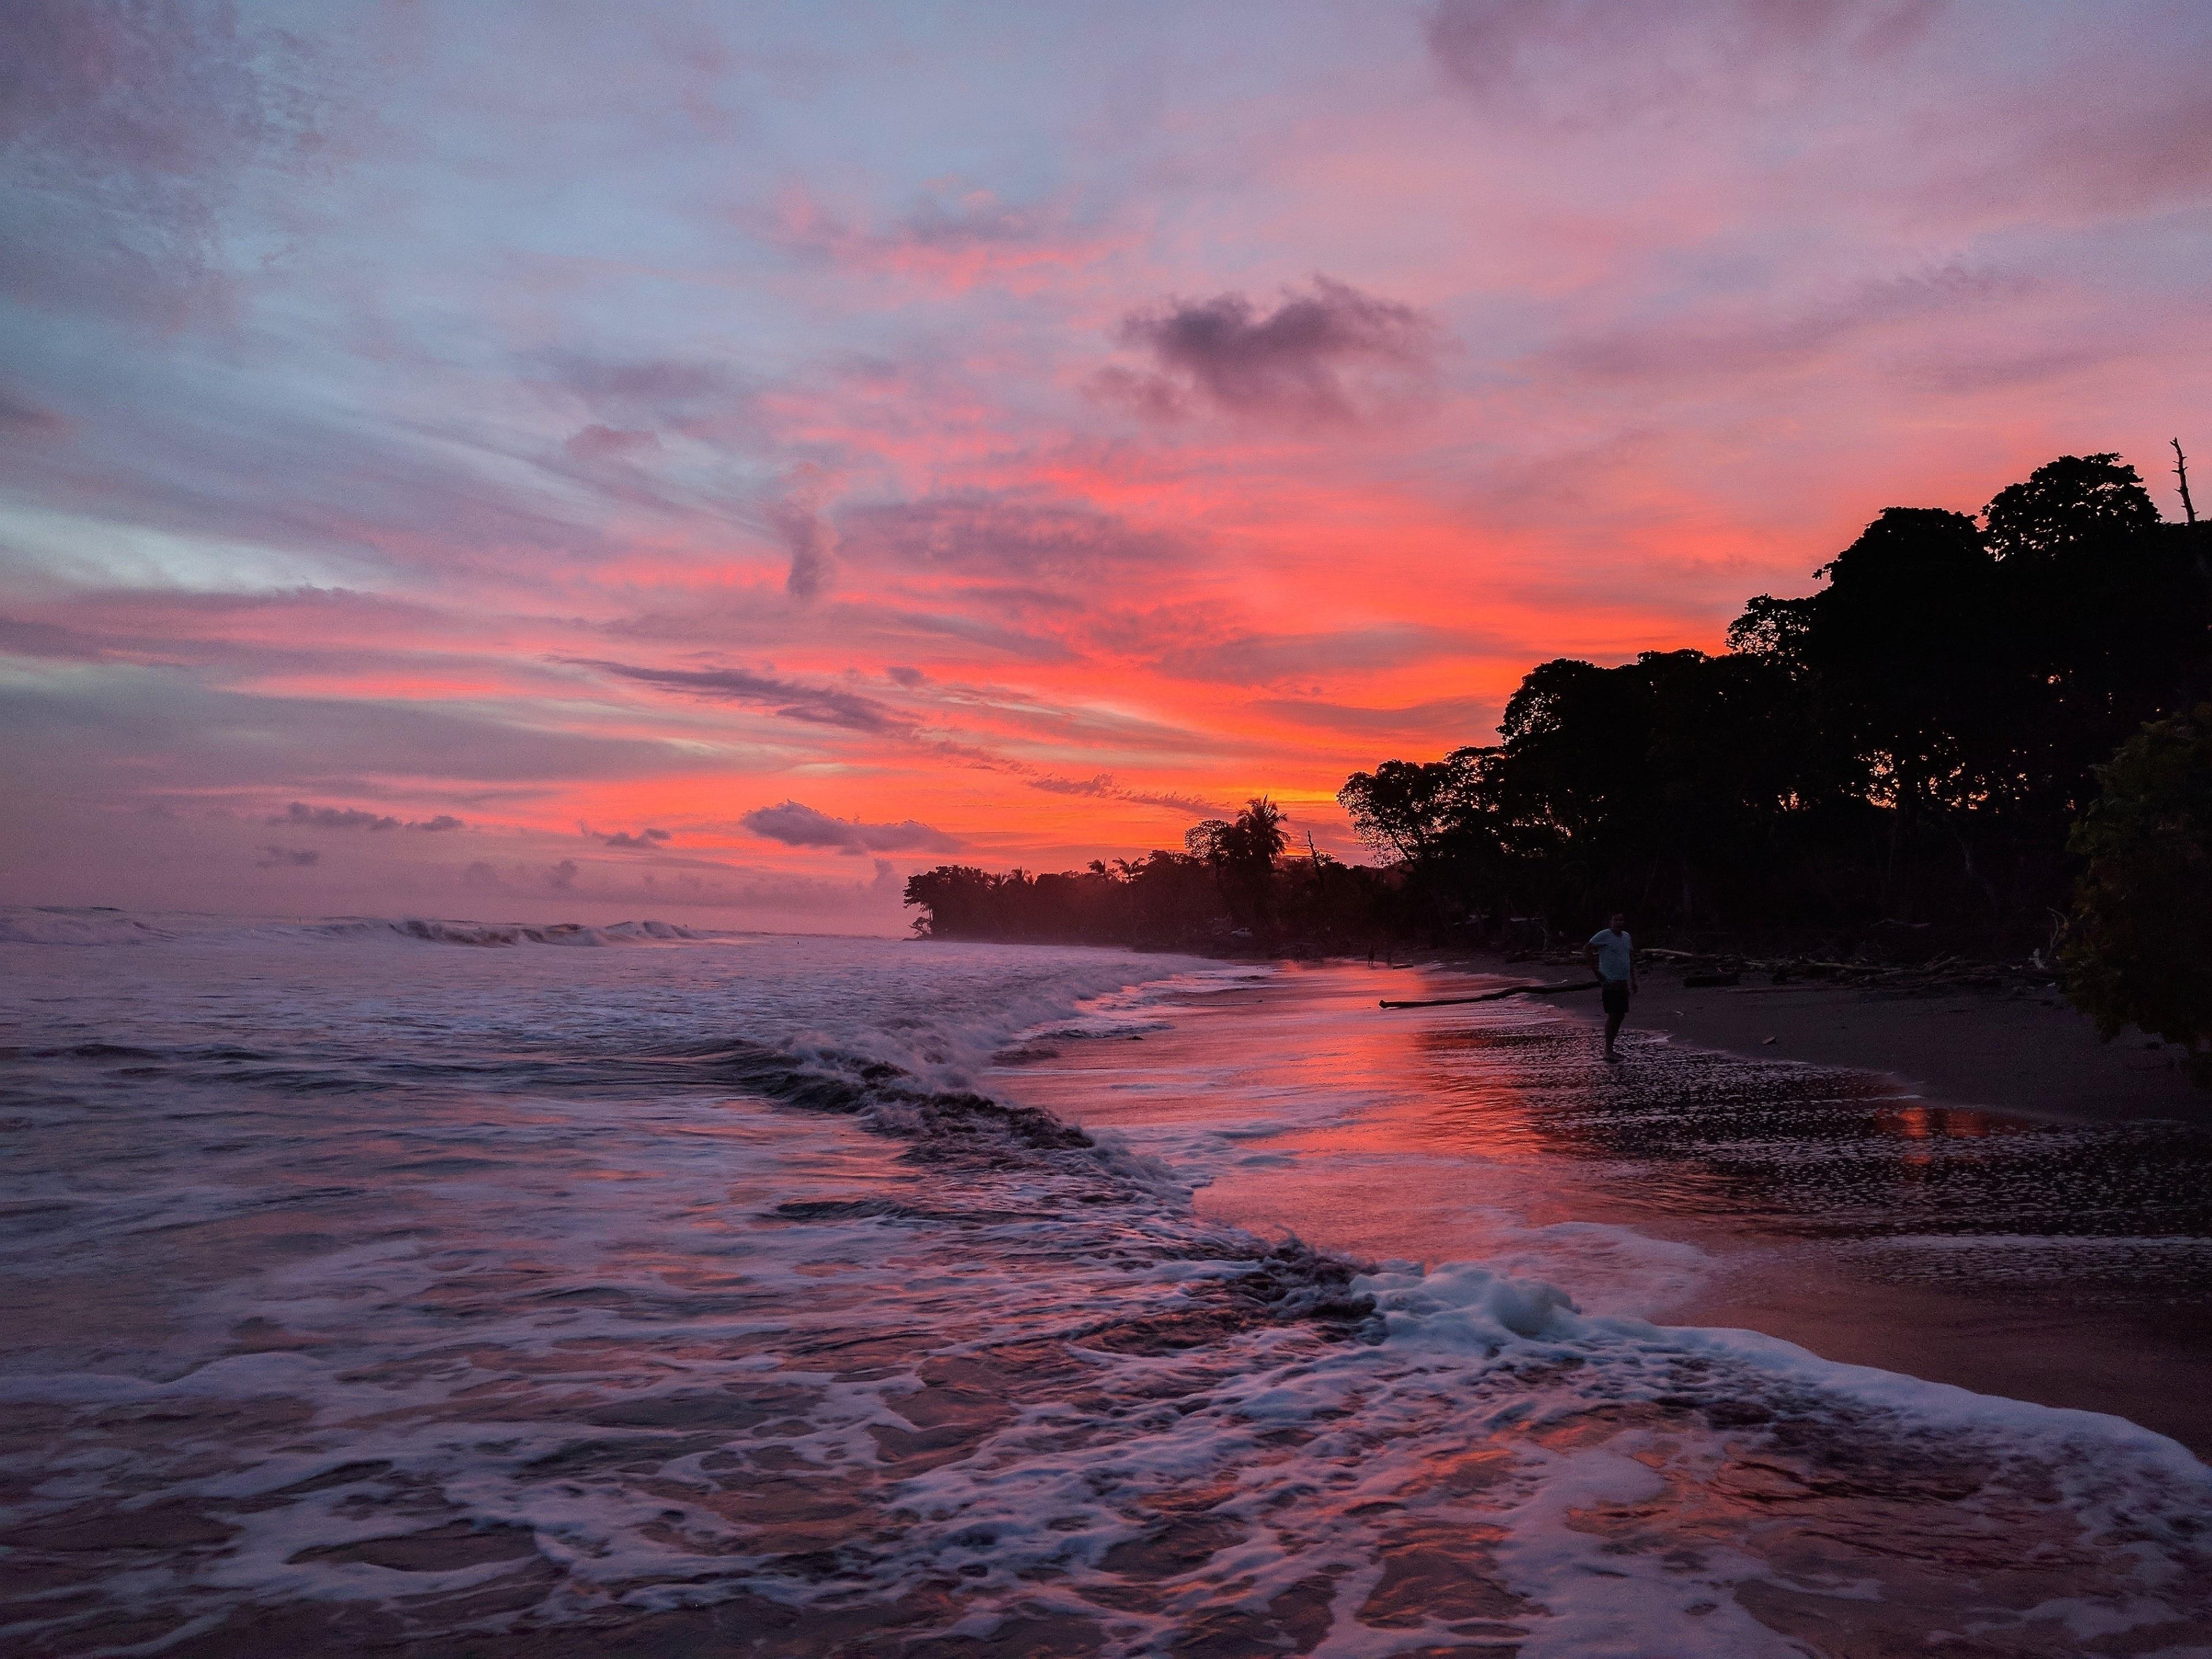 Cantón Parrita, Puntarenas Province, Costa Rica